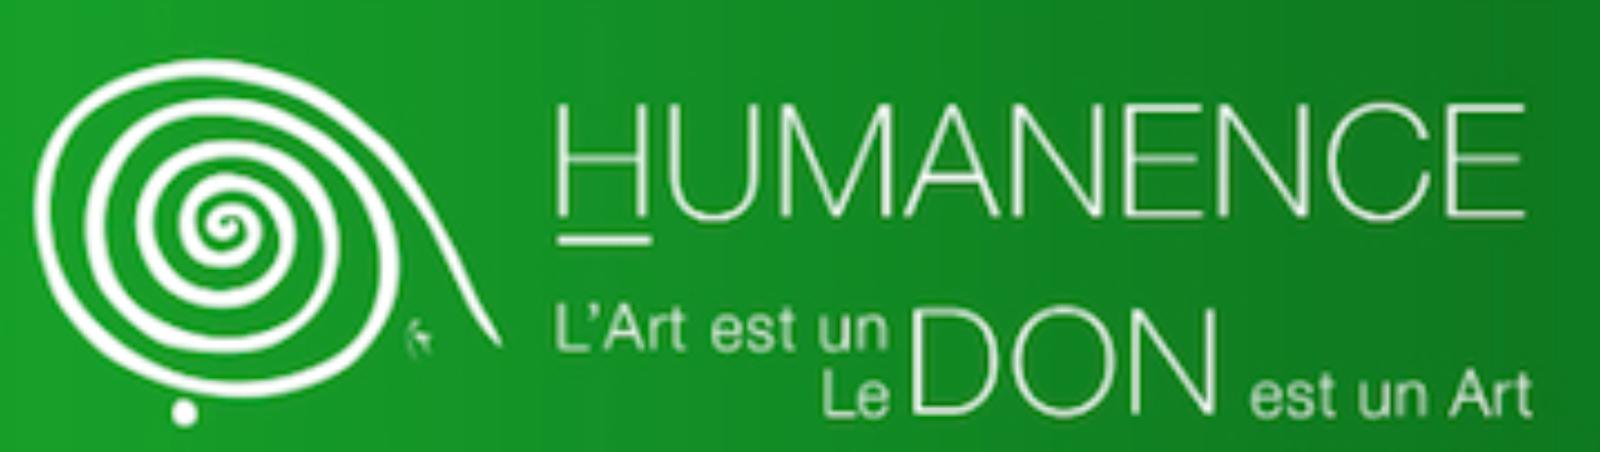 HUMANENCE - ASSOCIATION